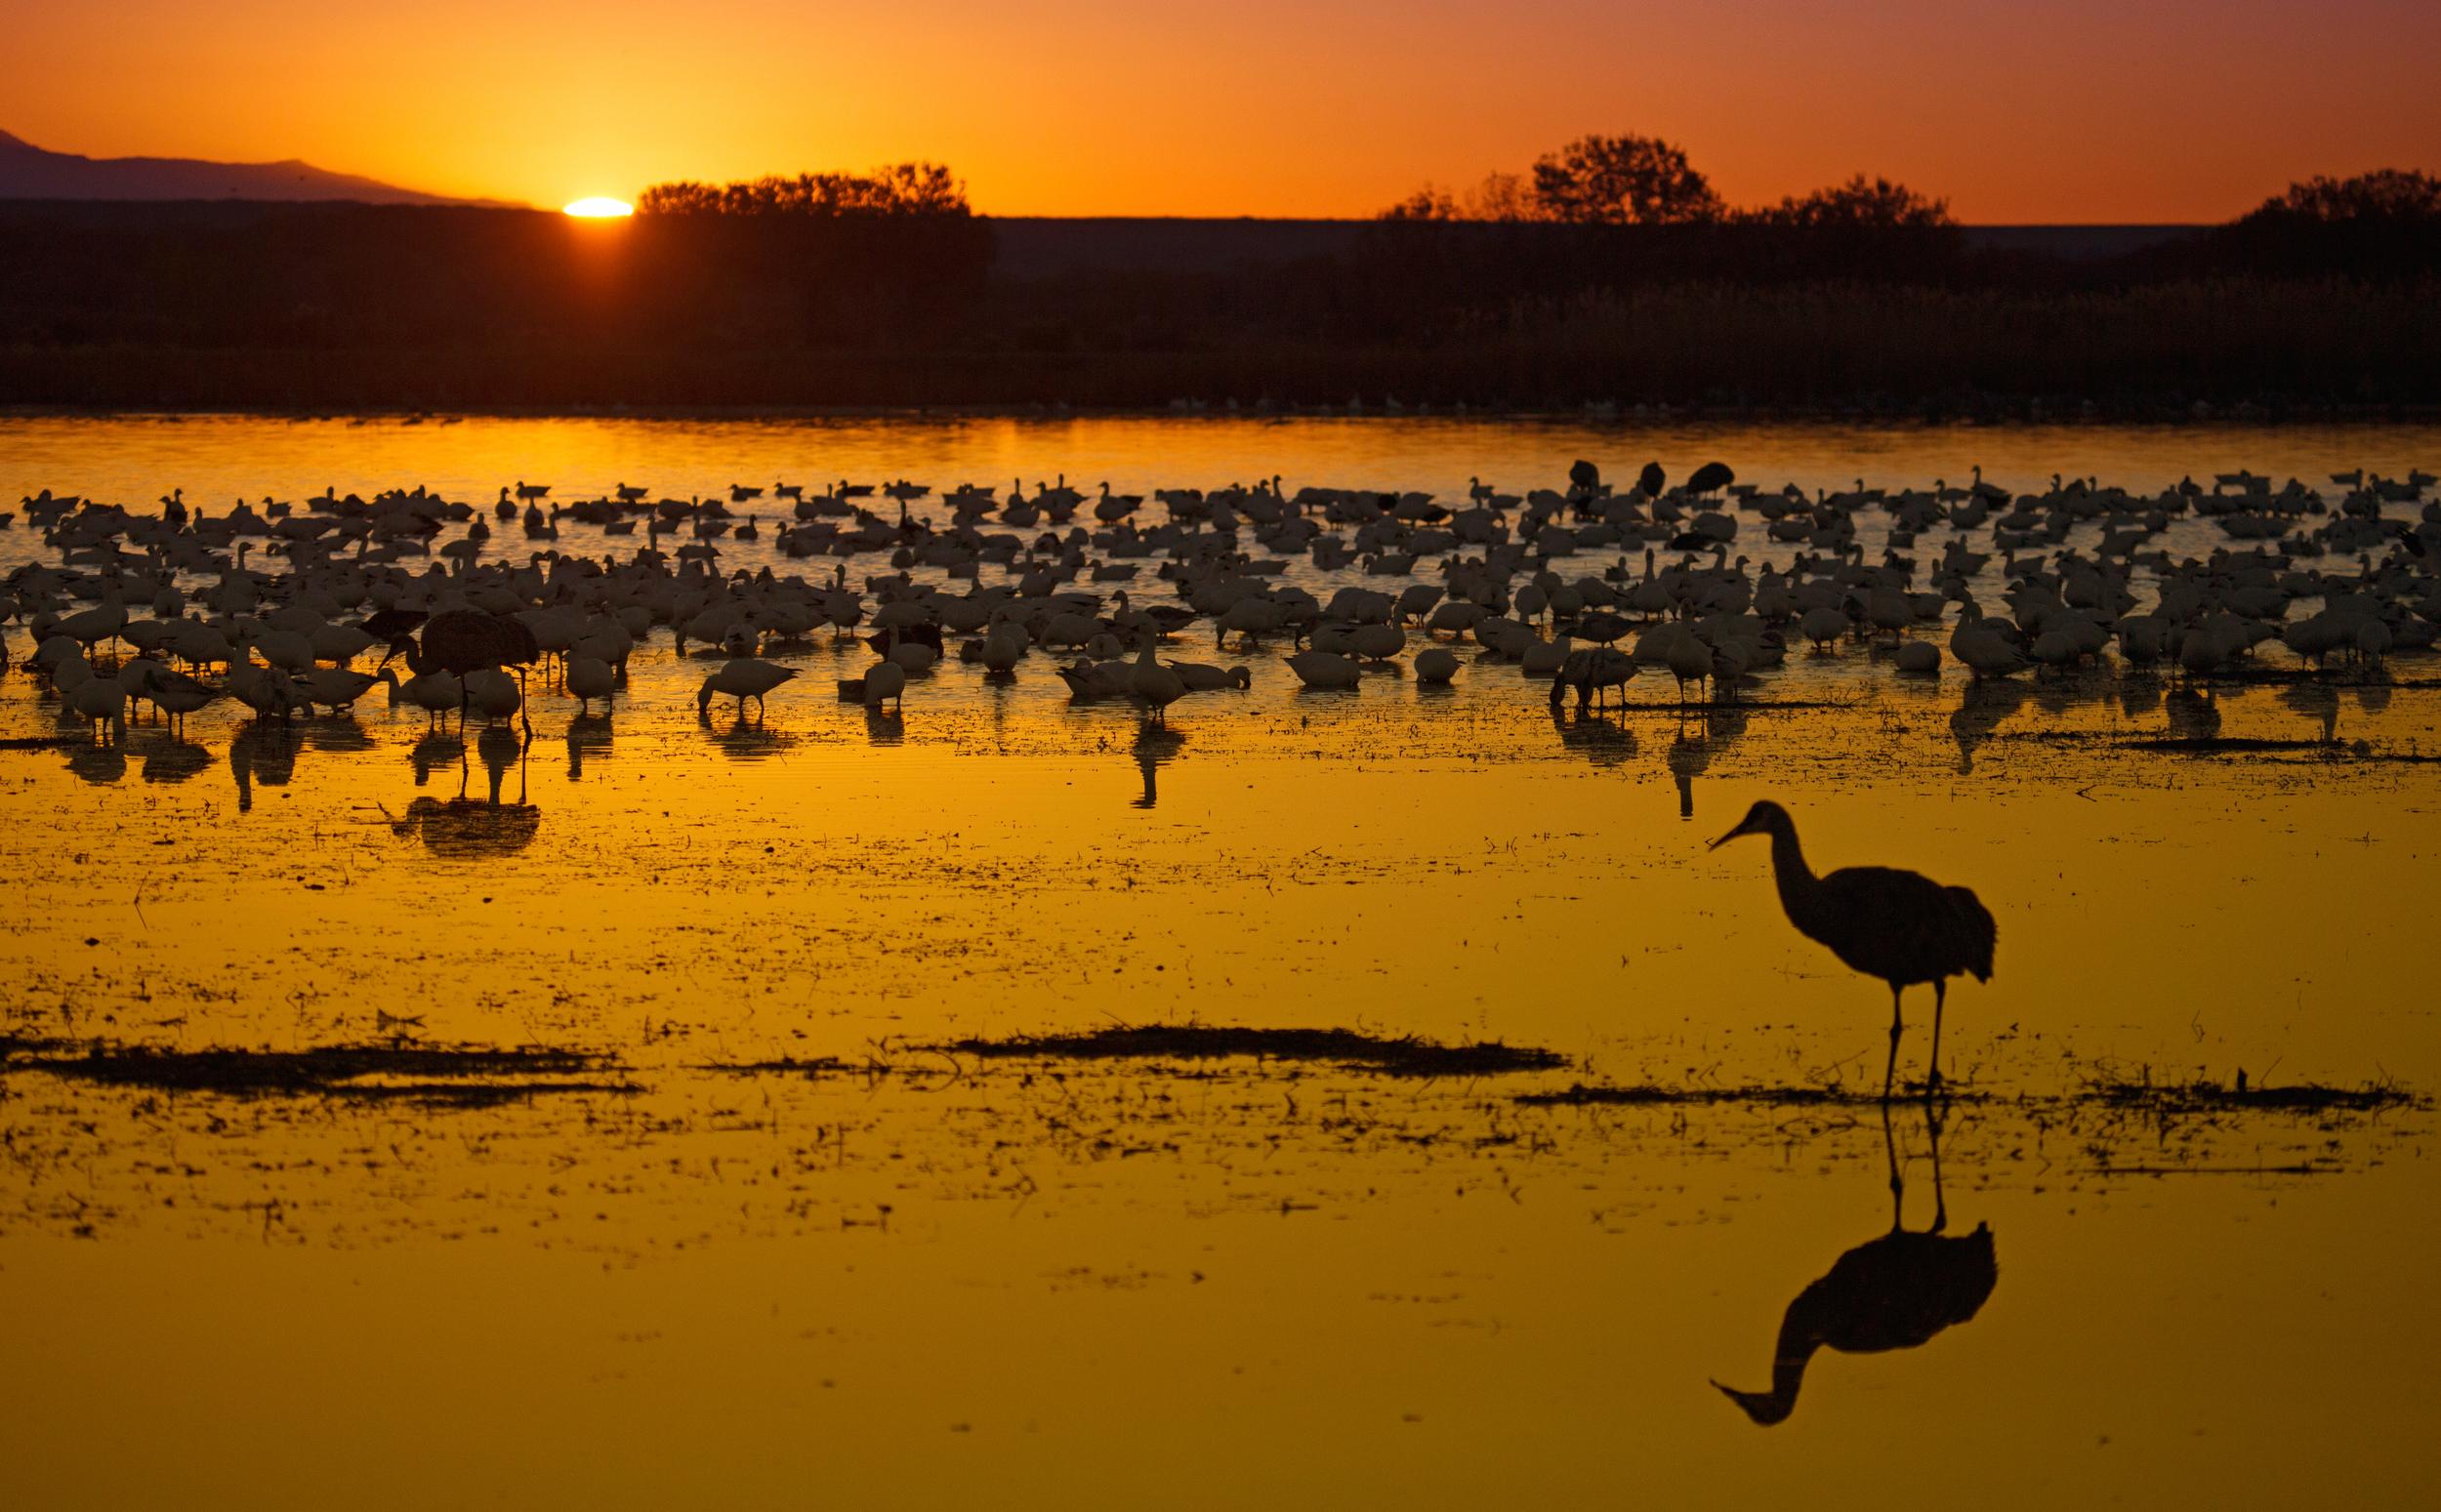 Rick Sammon's Birds044.jpg